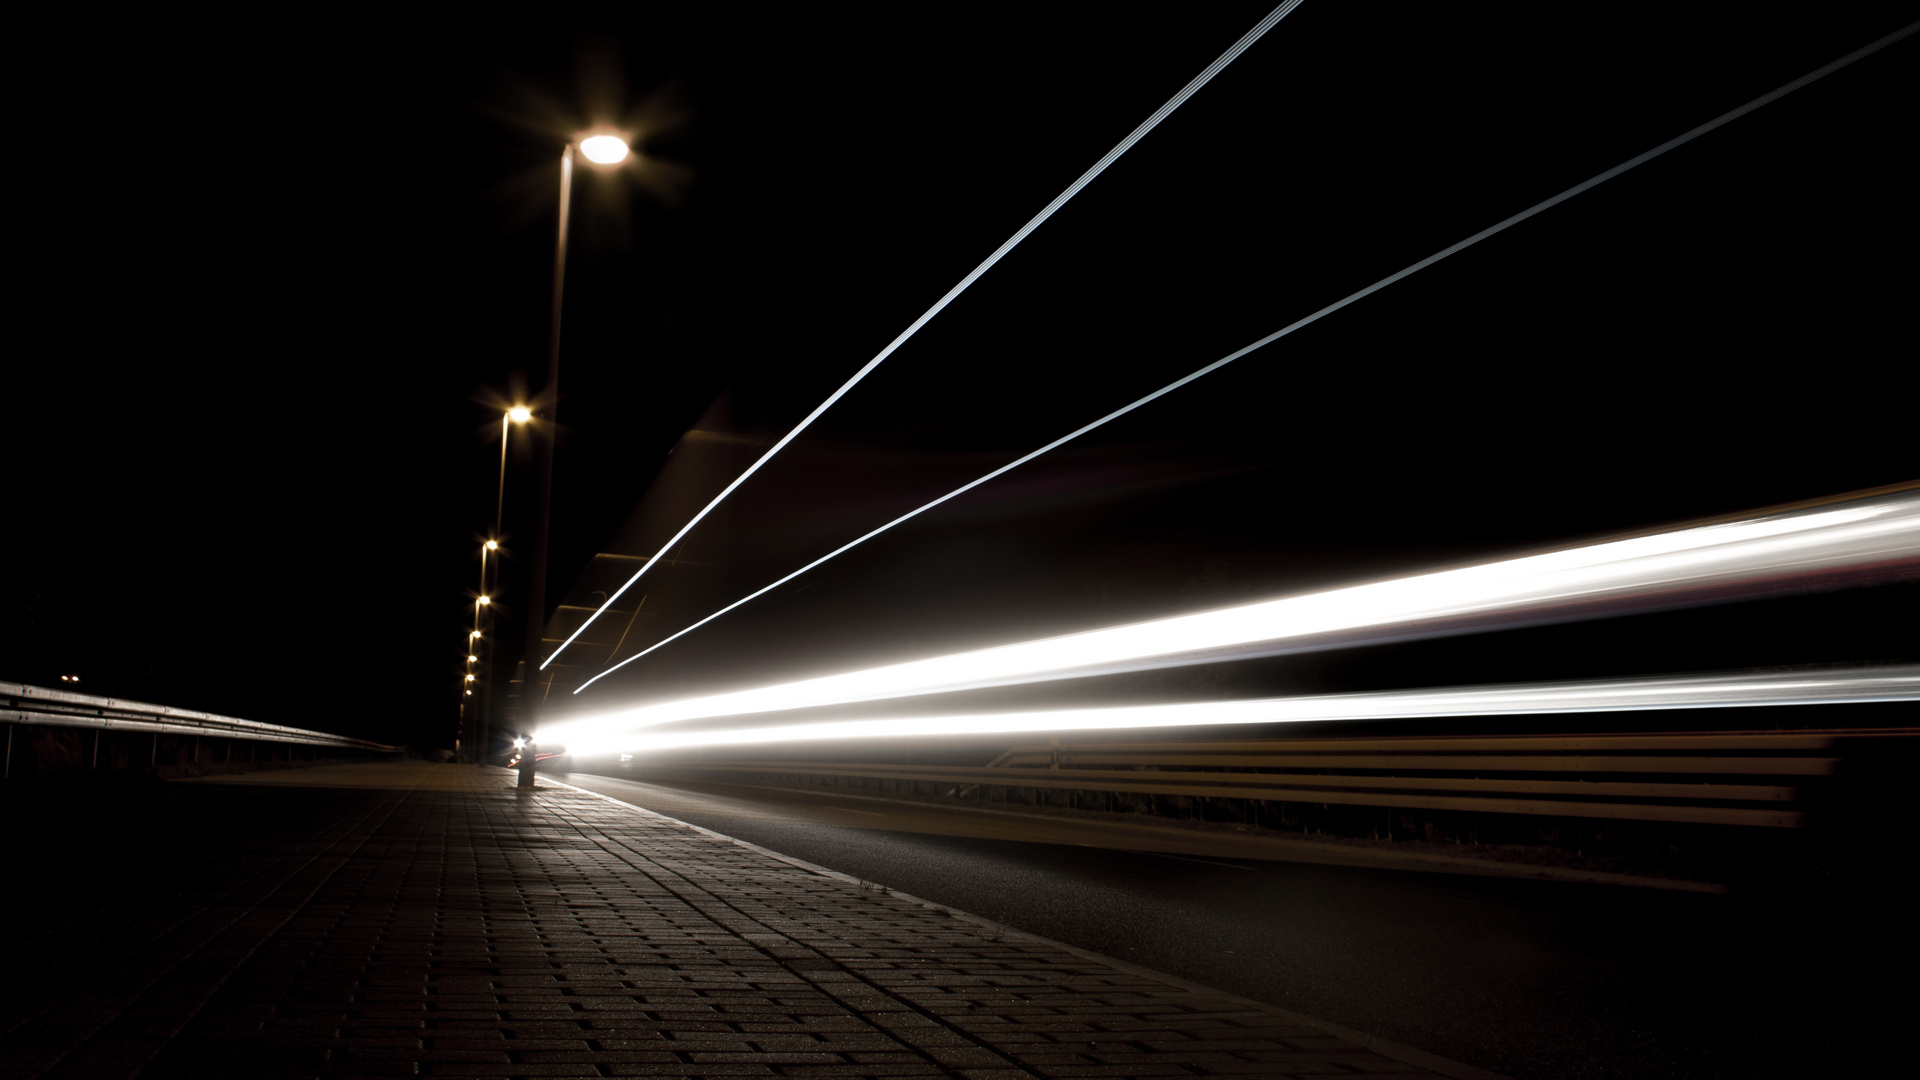 fast at night